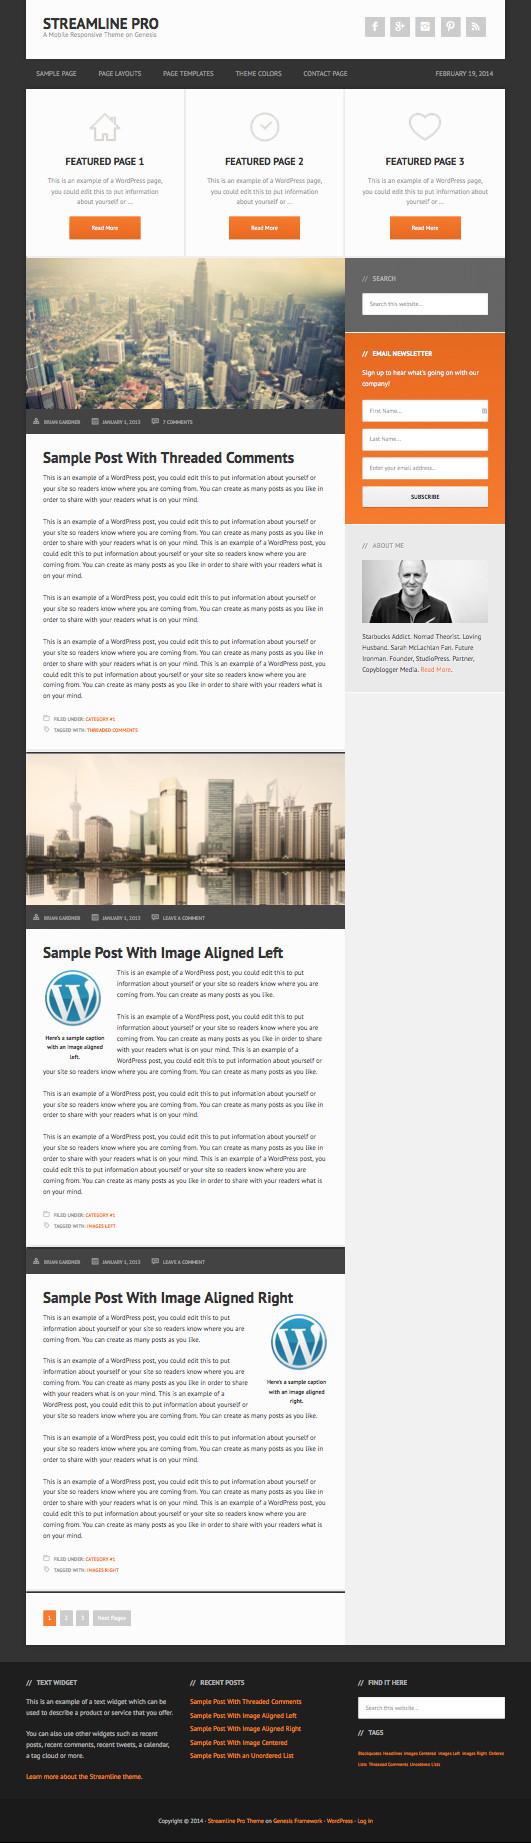 Streamline Pro Newspaper Theme – Wpchats.com